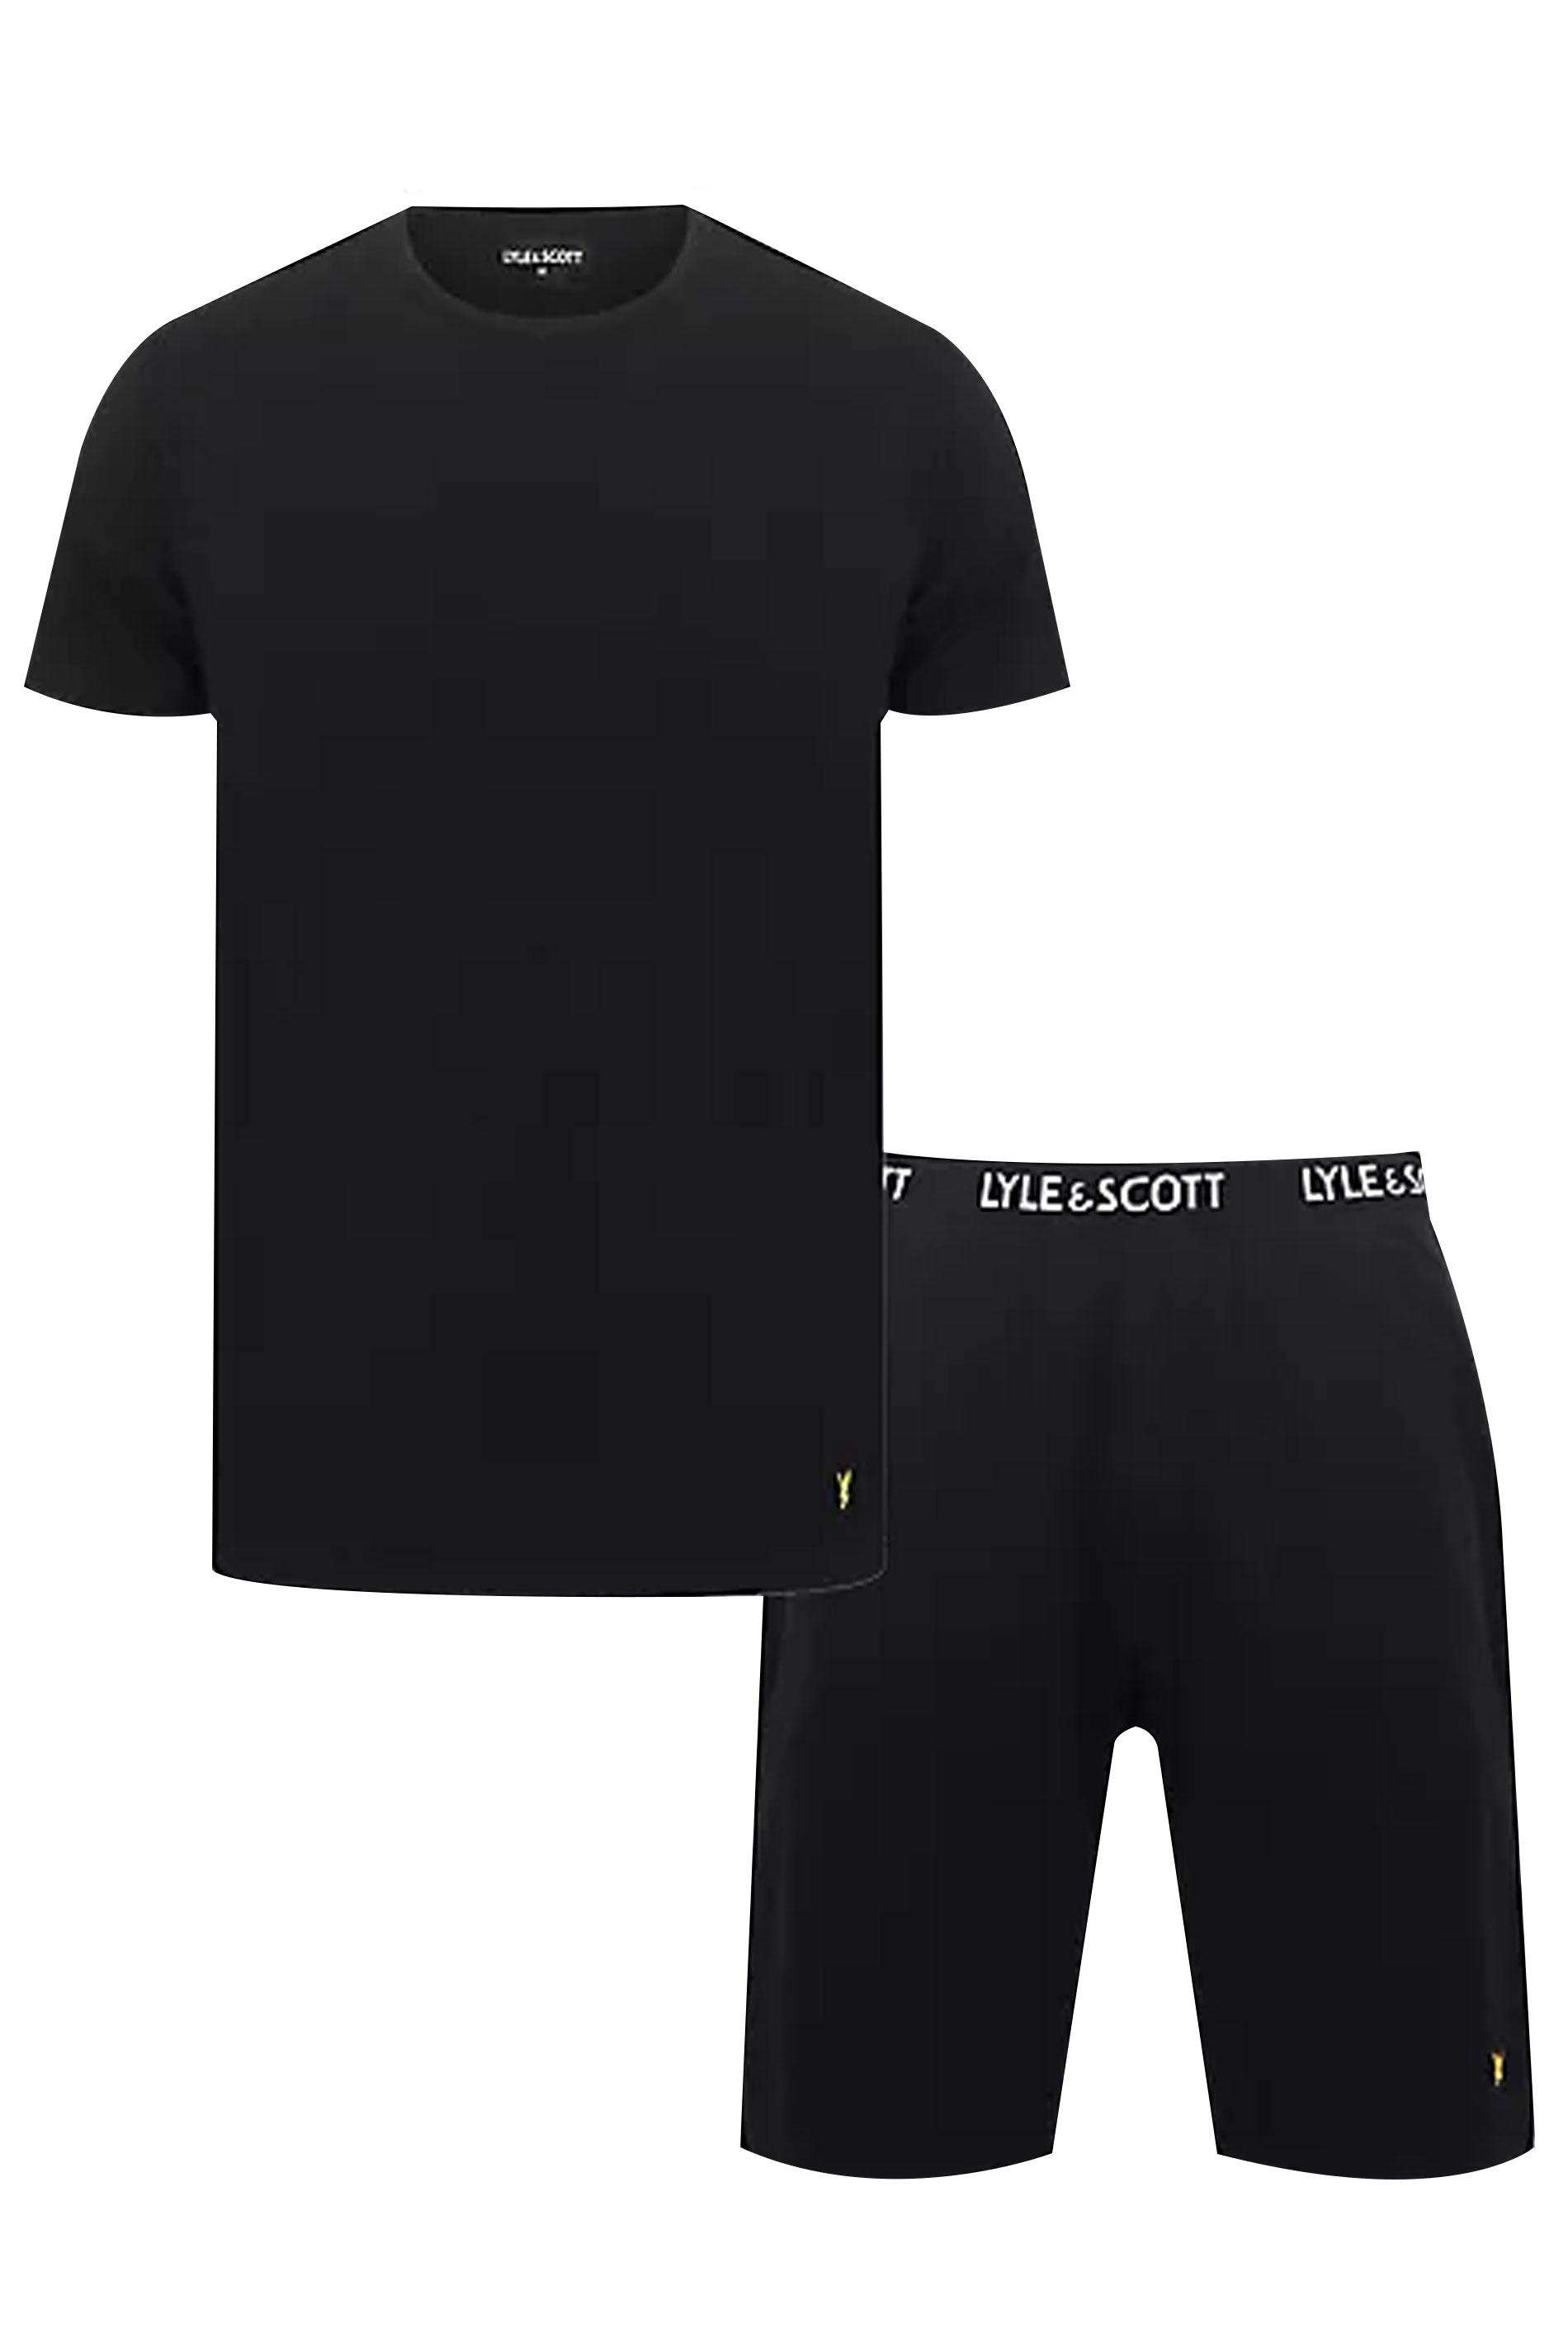 LYLE & SCOTT T-Shirt & Shorts Lounge Set, Schwarz